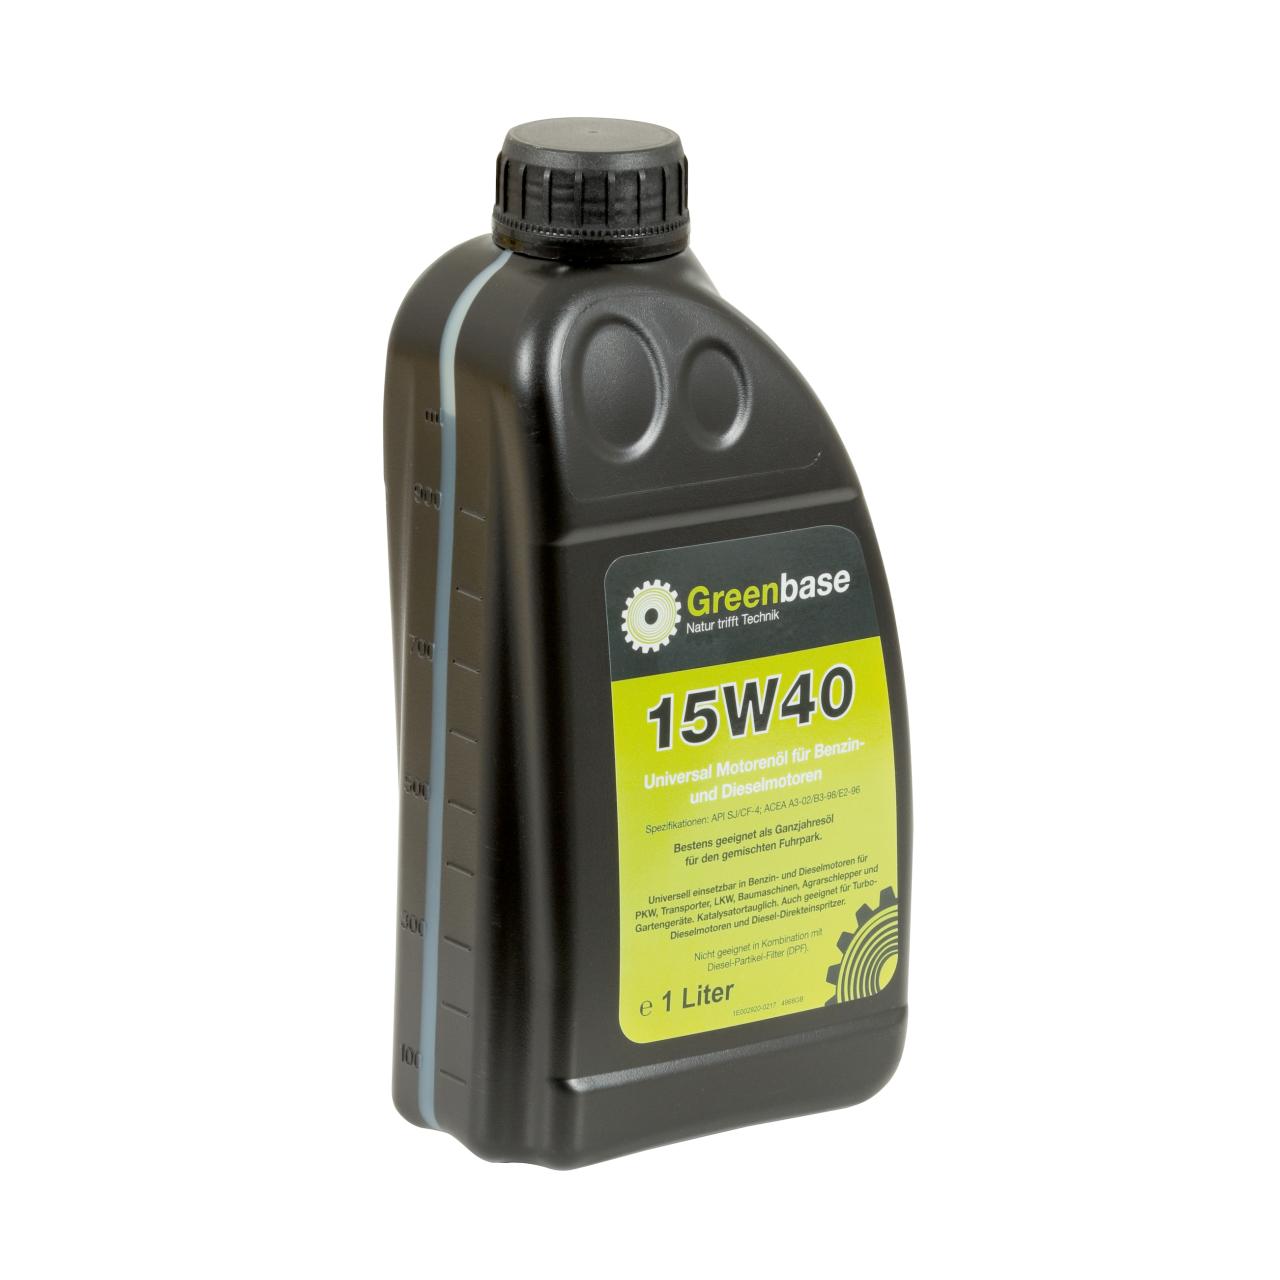 Motorenöl 15W40 API 1Ltr.Flasche